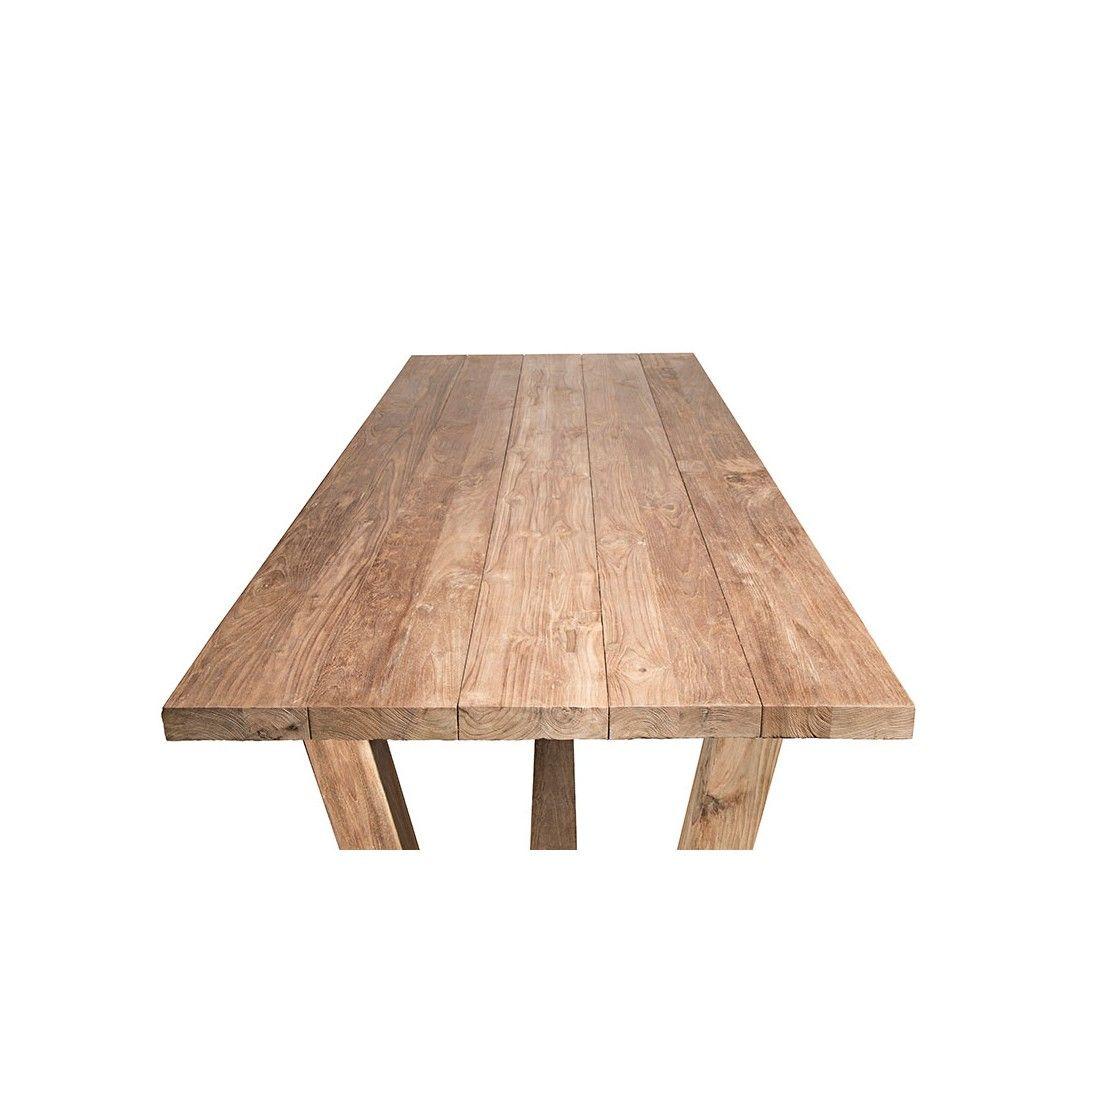 Table en vieux teck massif 250 cm, Dundee